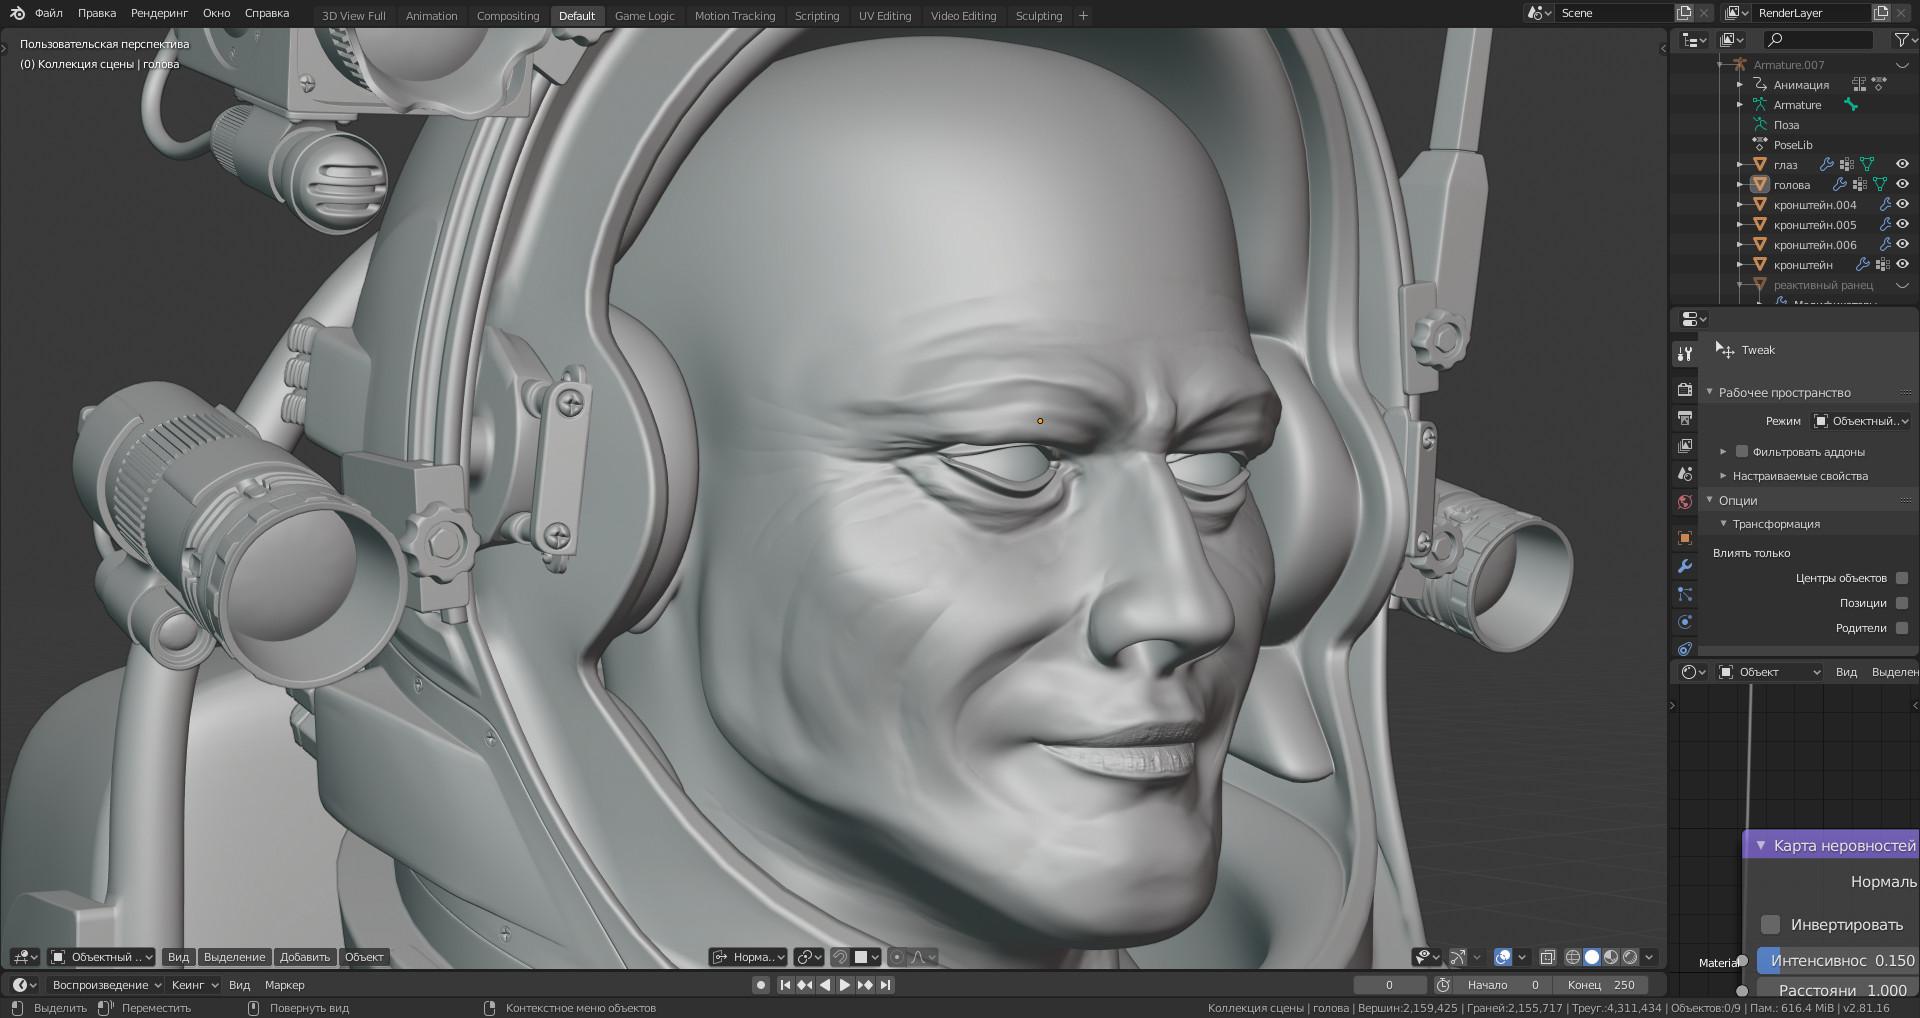 космонавт11.jpg